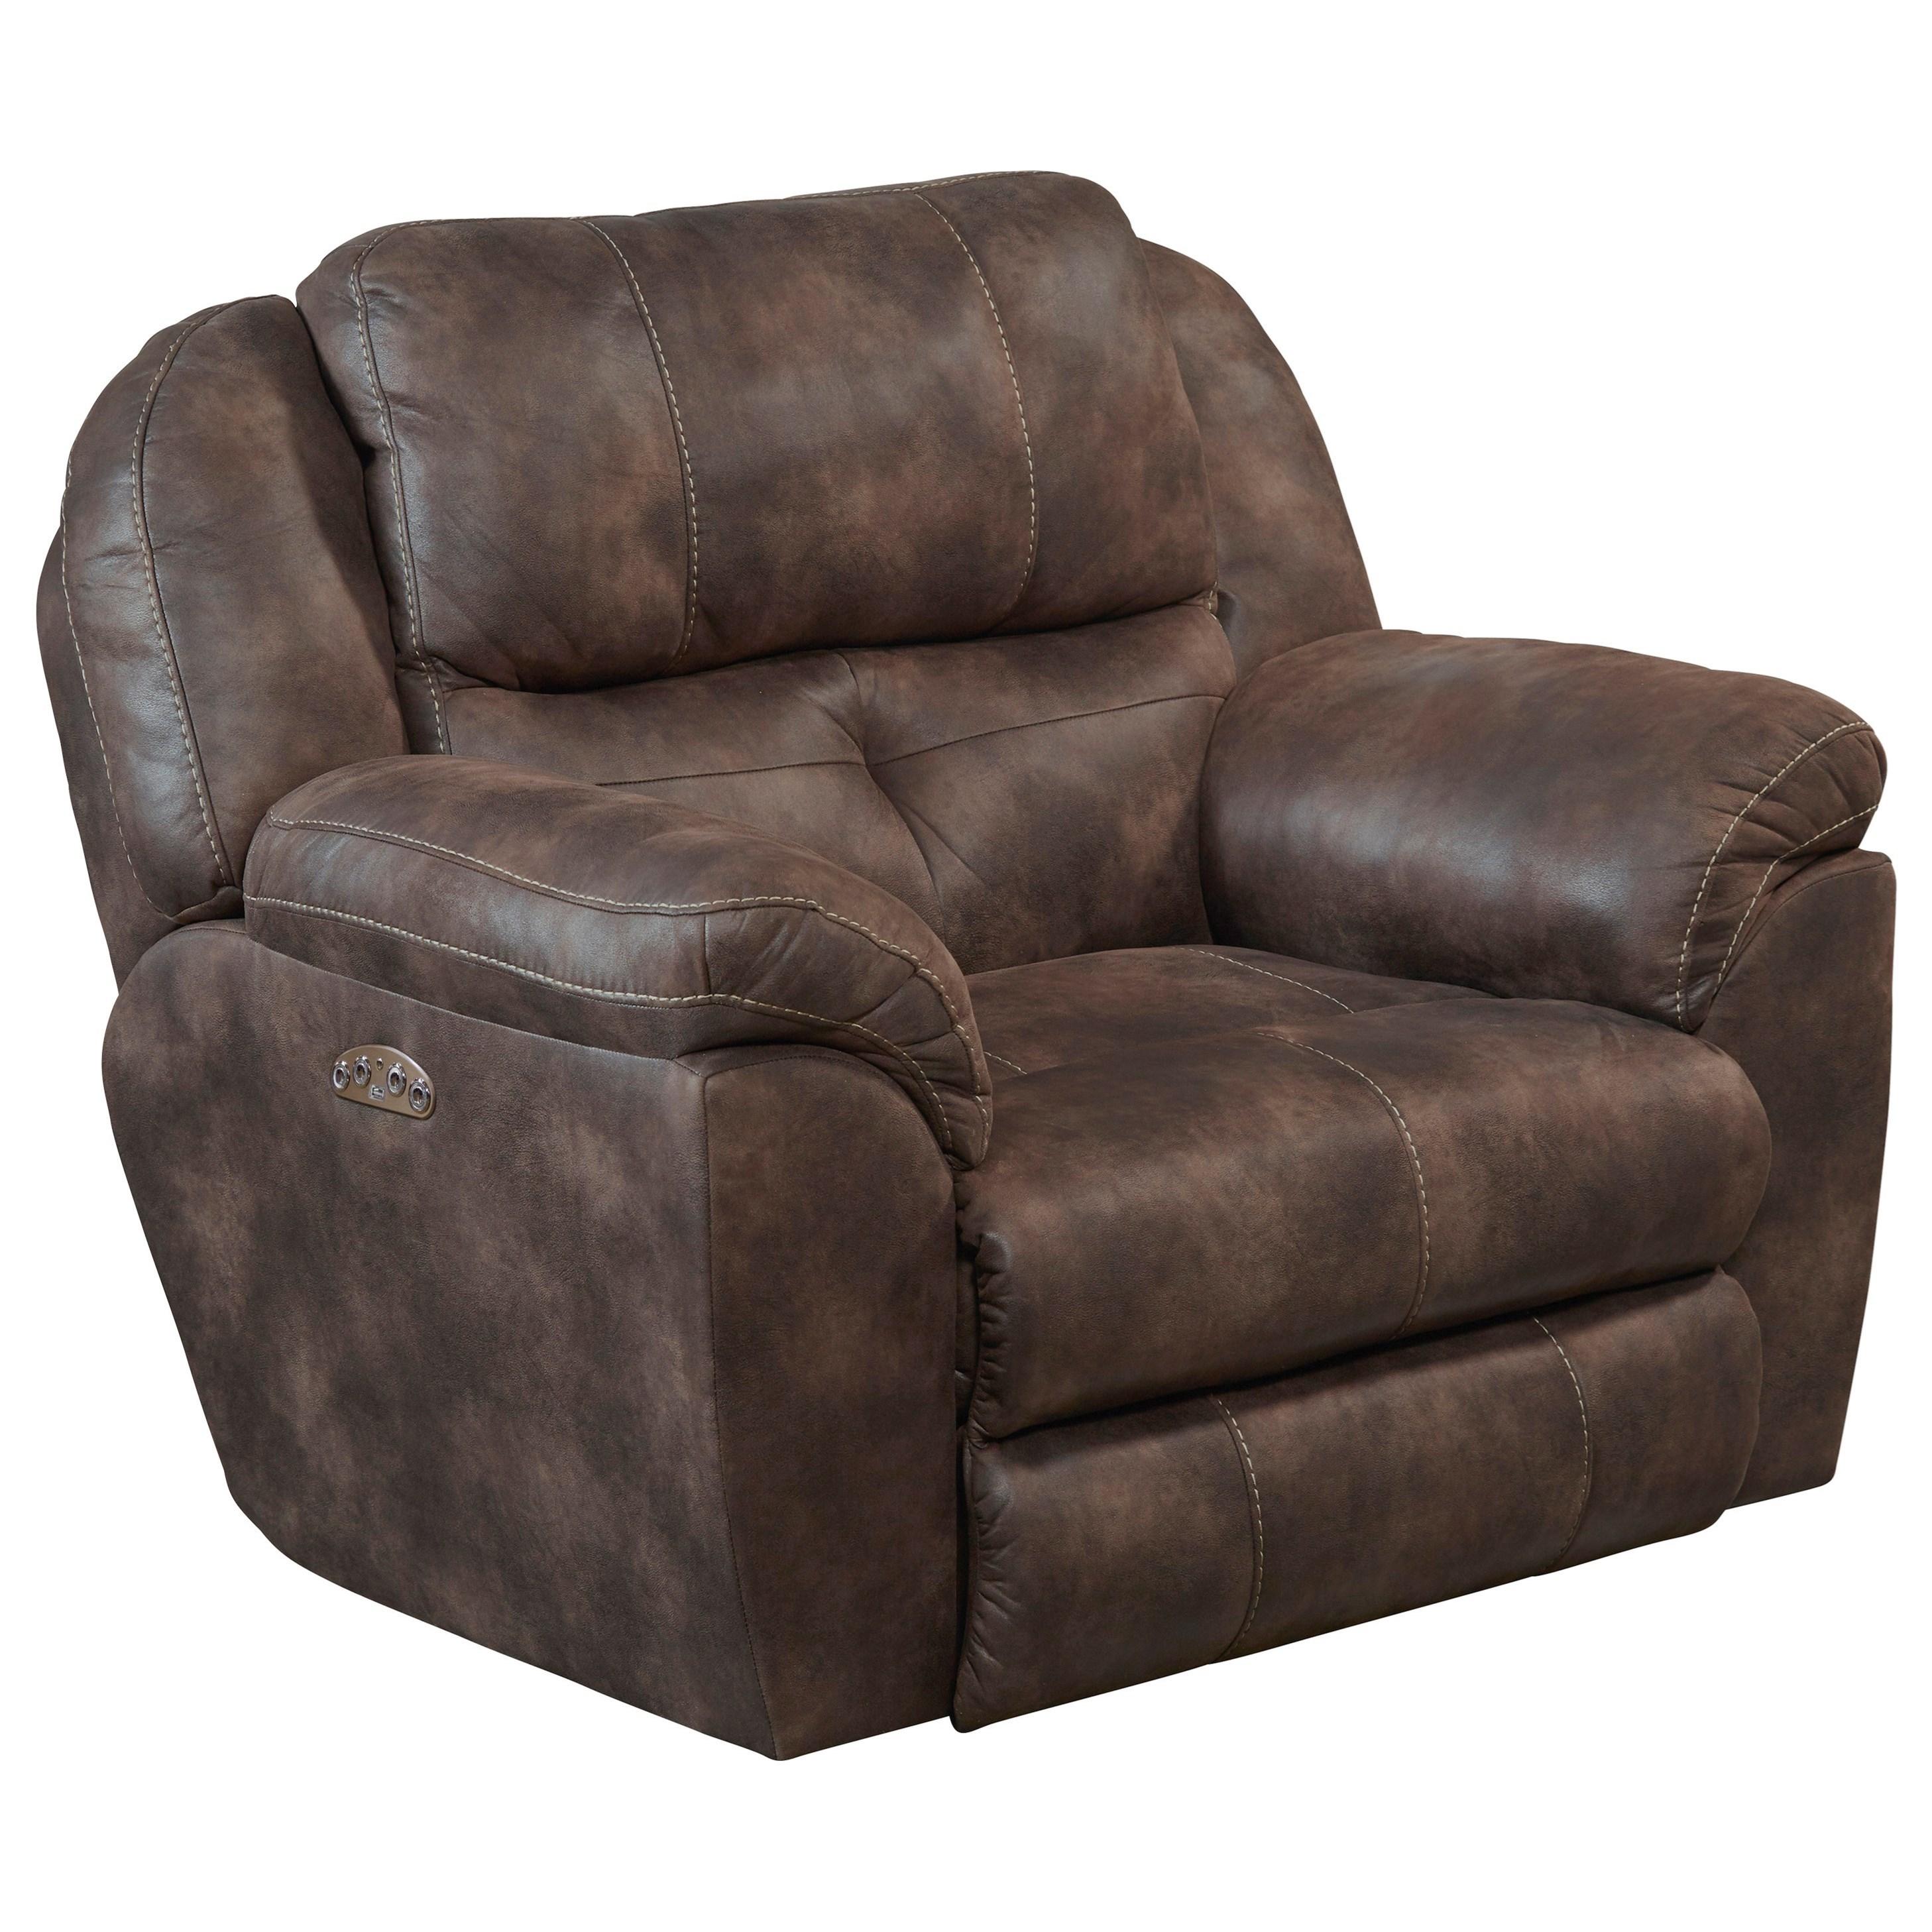 Ferrington Power Headrest Lay Flat Recliner w/ Lumbar by Catnapper at Gill Brothers Furniture